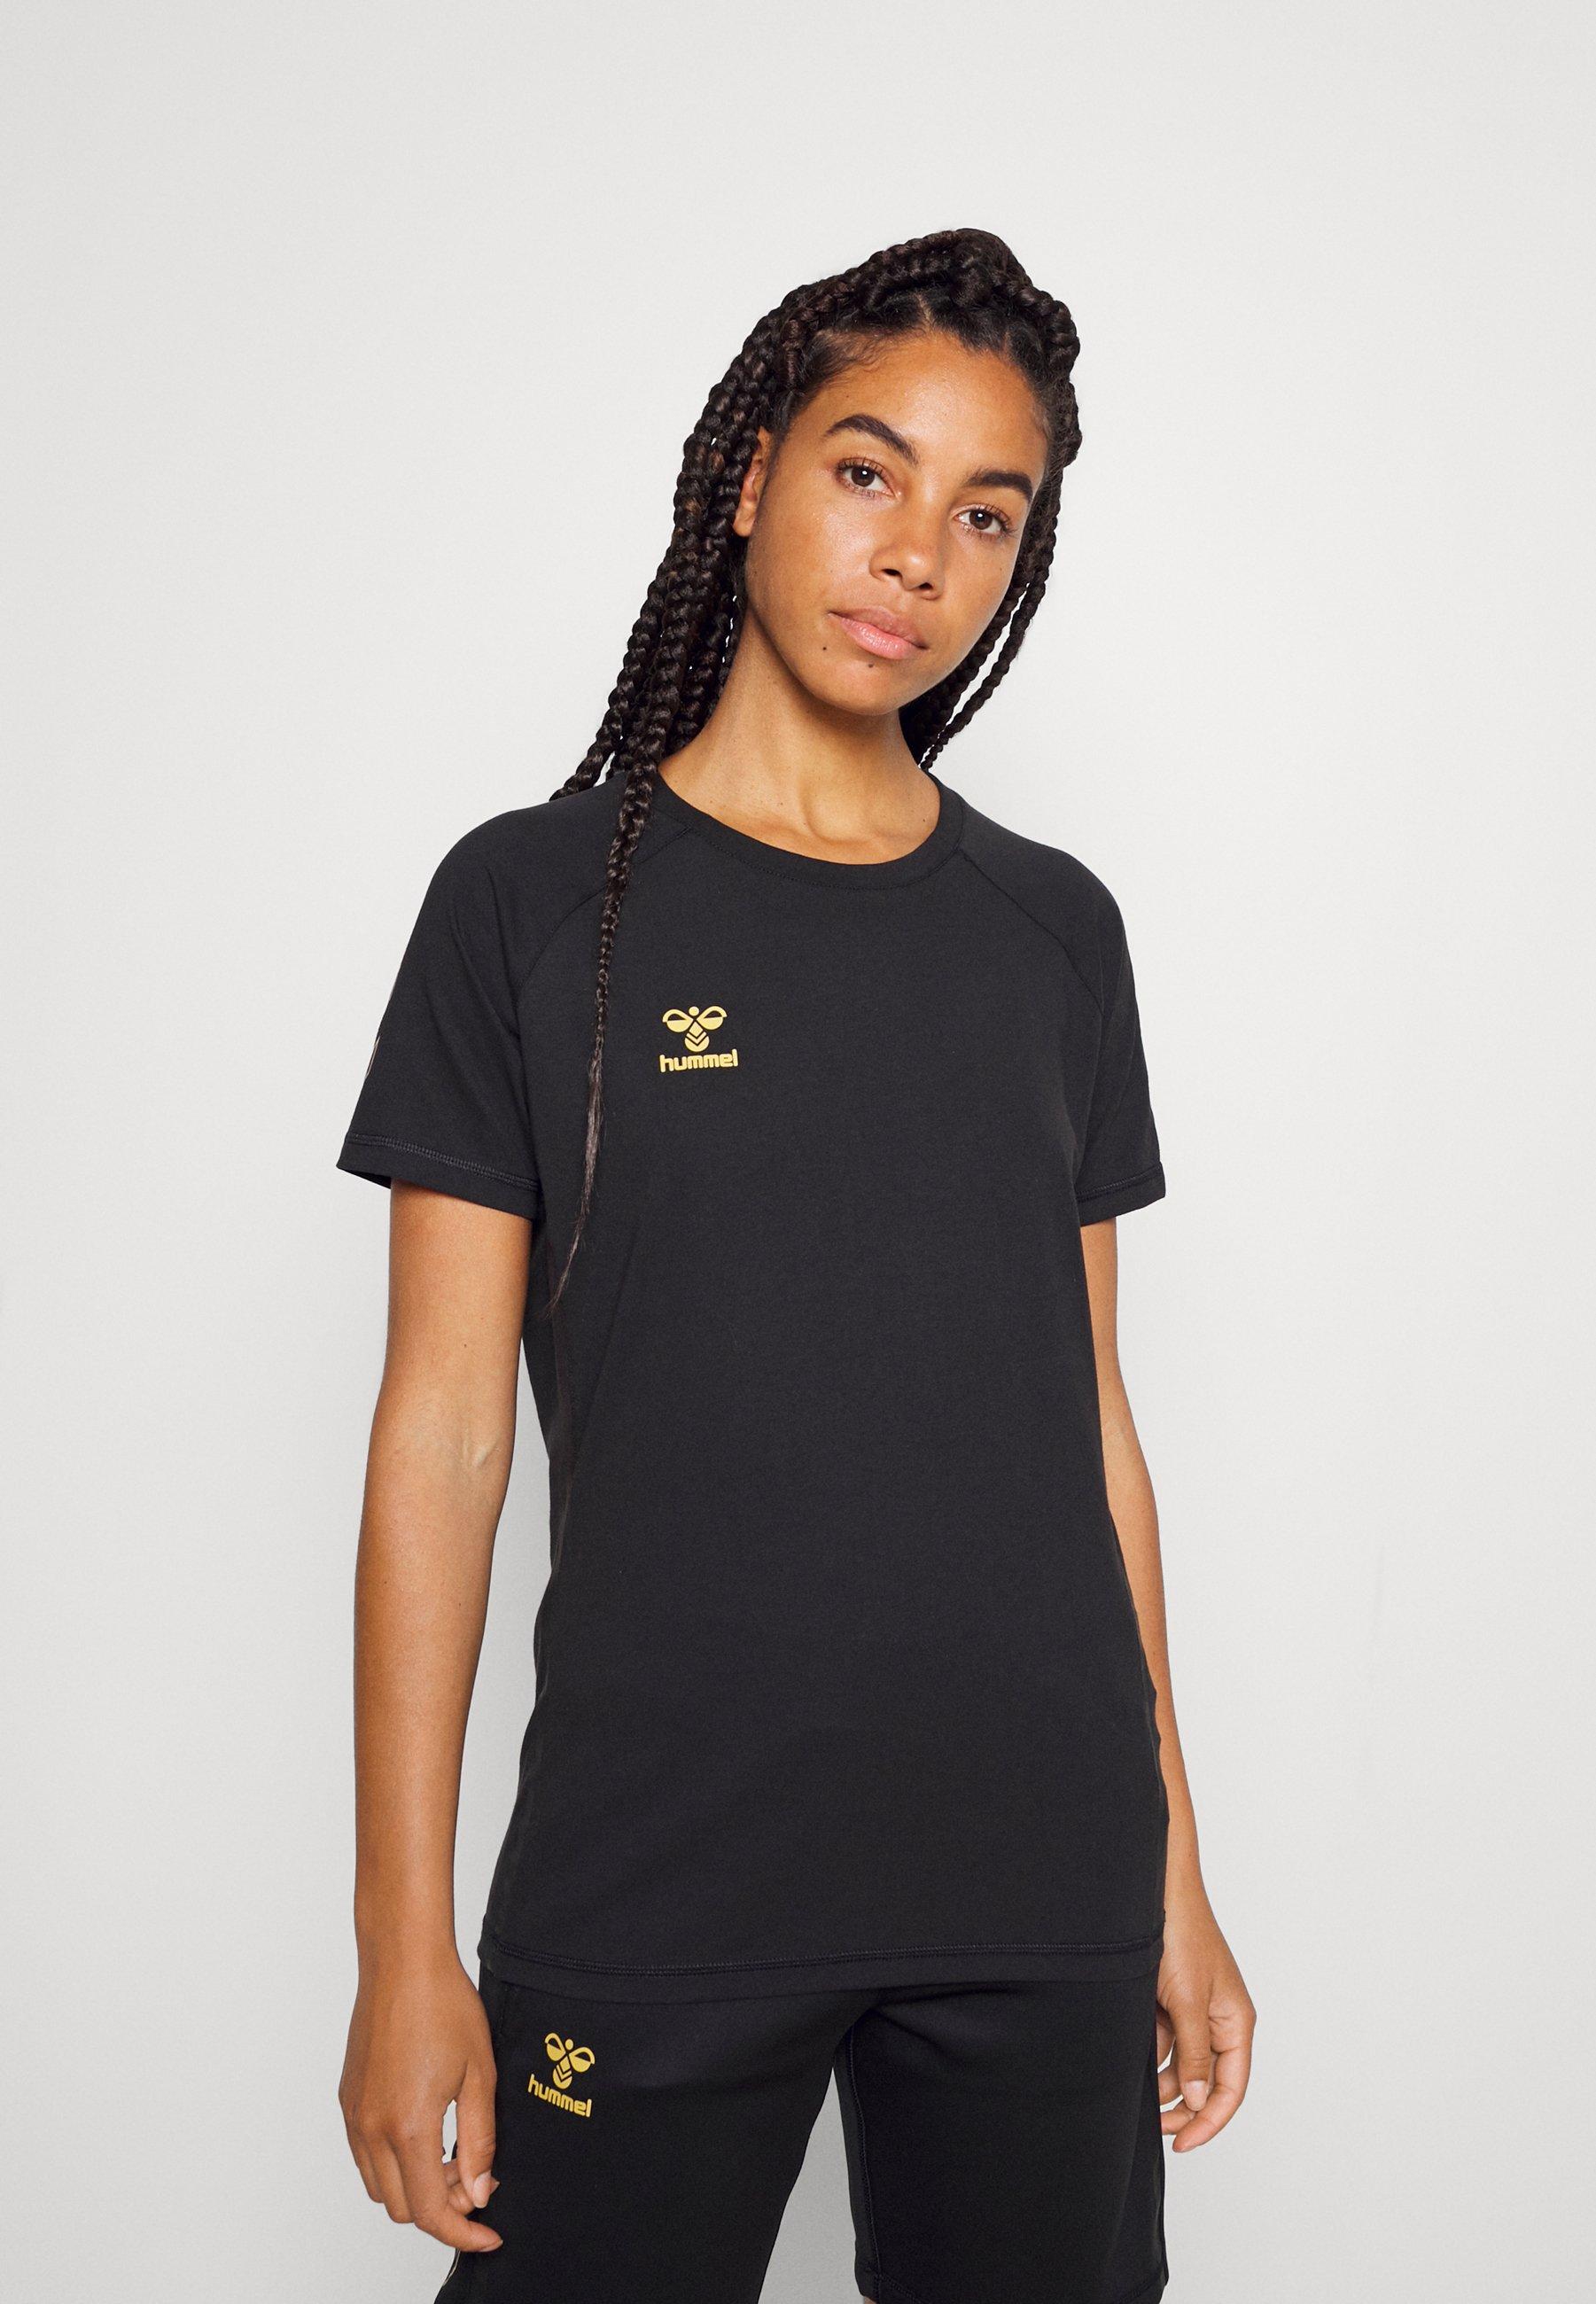 Women CIMA XK WOMAN - Print T-shirt